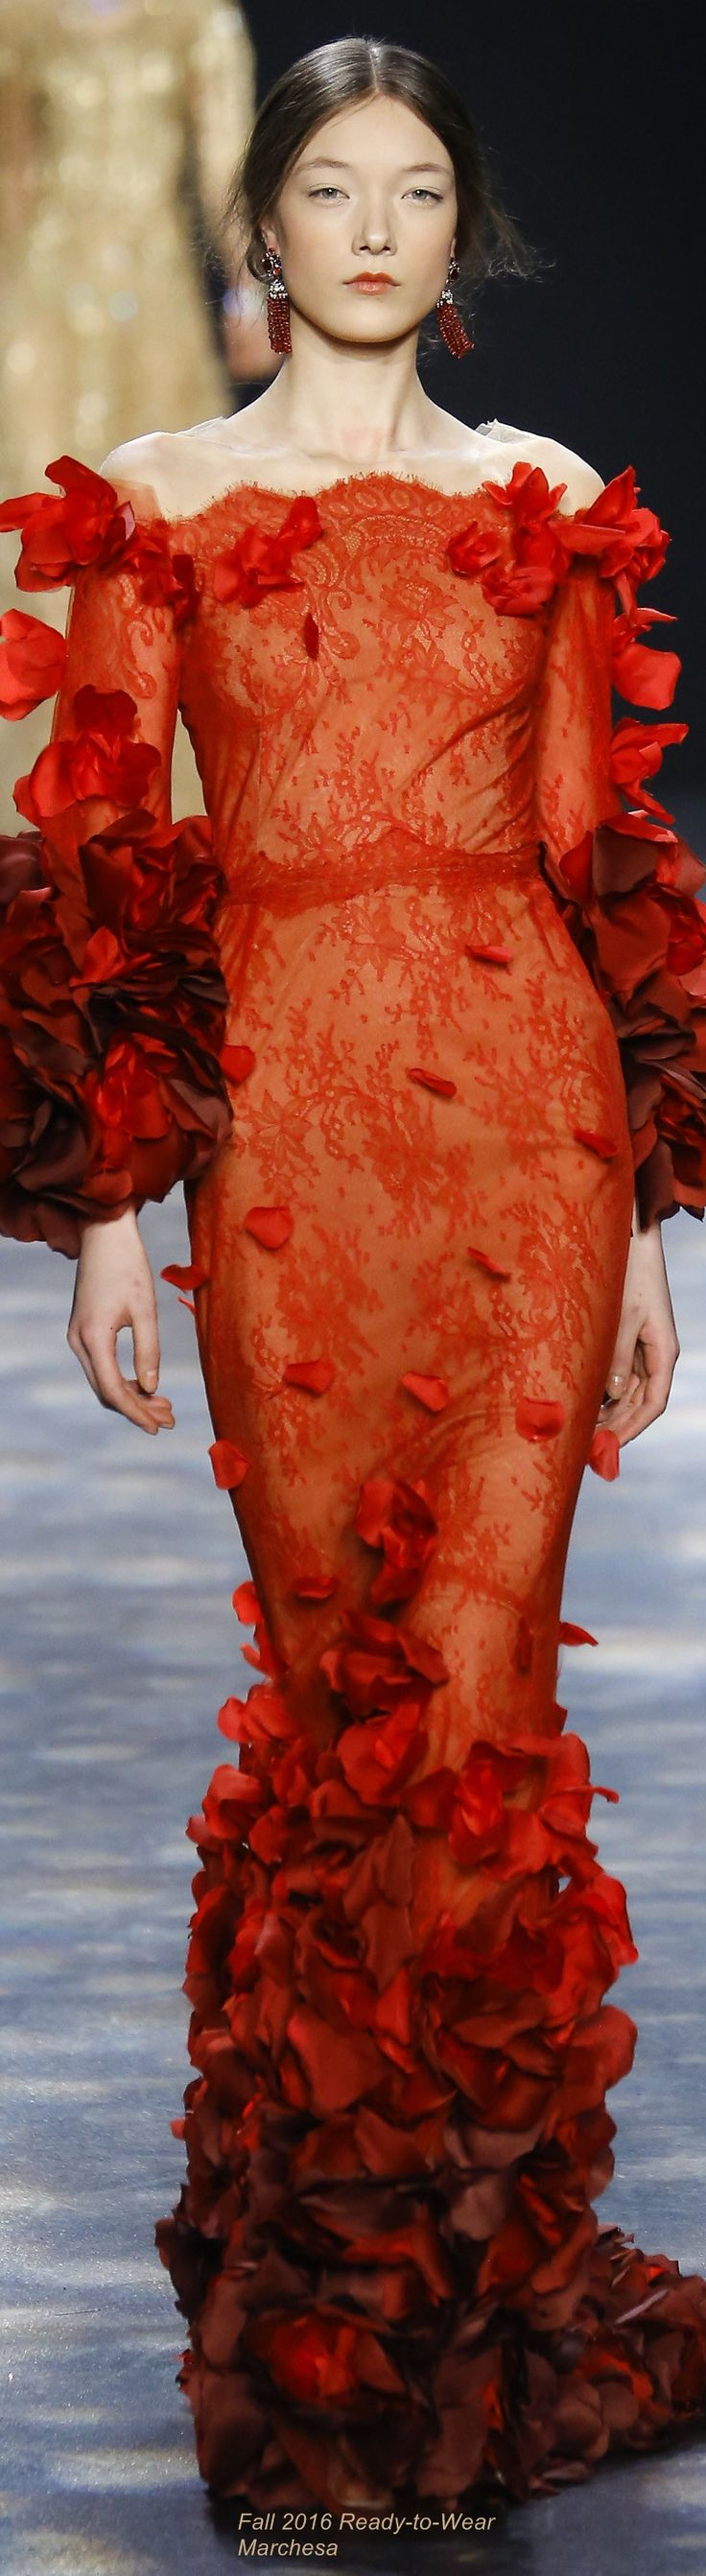 best closeups images on pinterest fashion details high